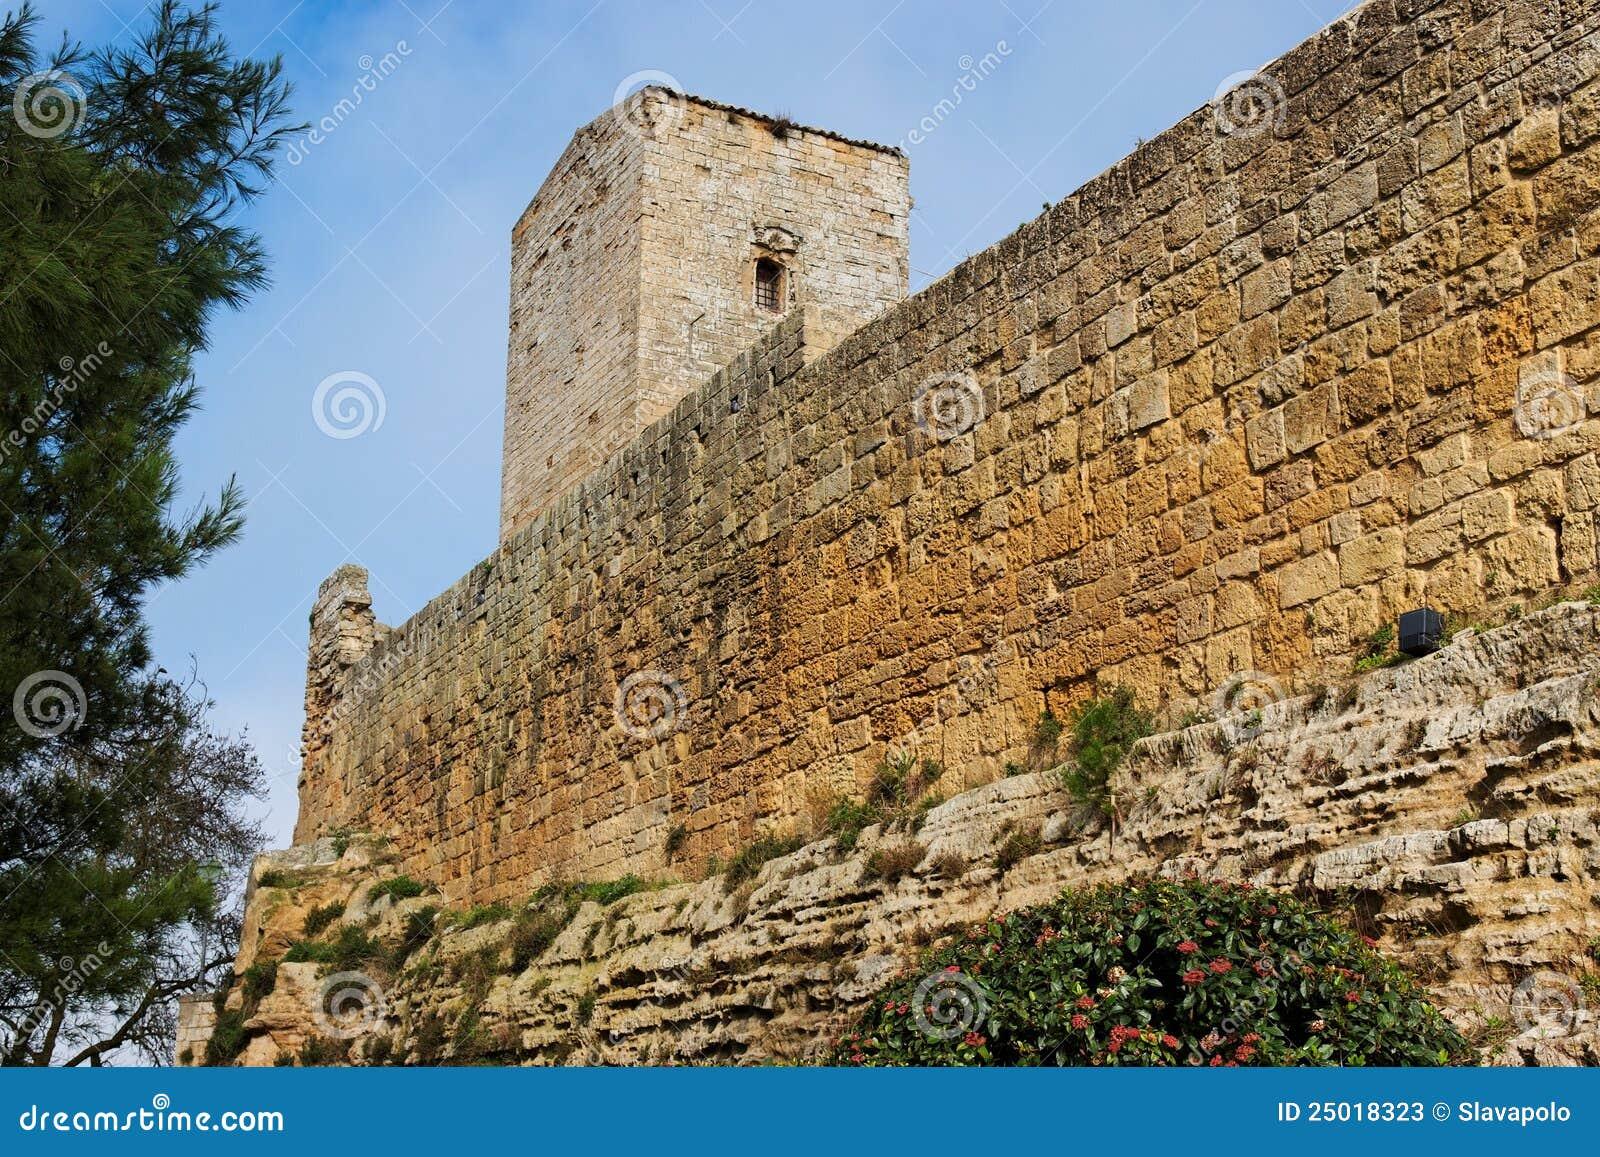 Castello Di Lombardia middeleeuws kasteel in Enna, Sic